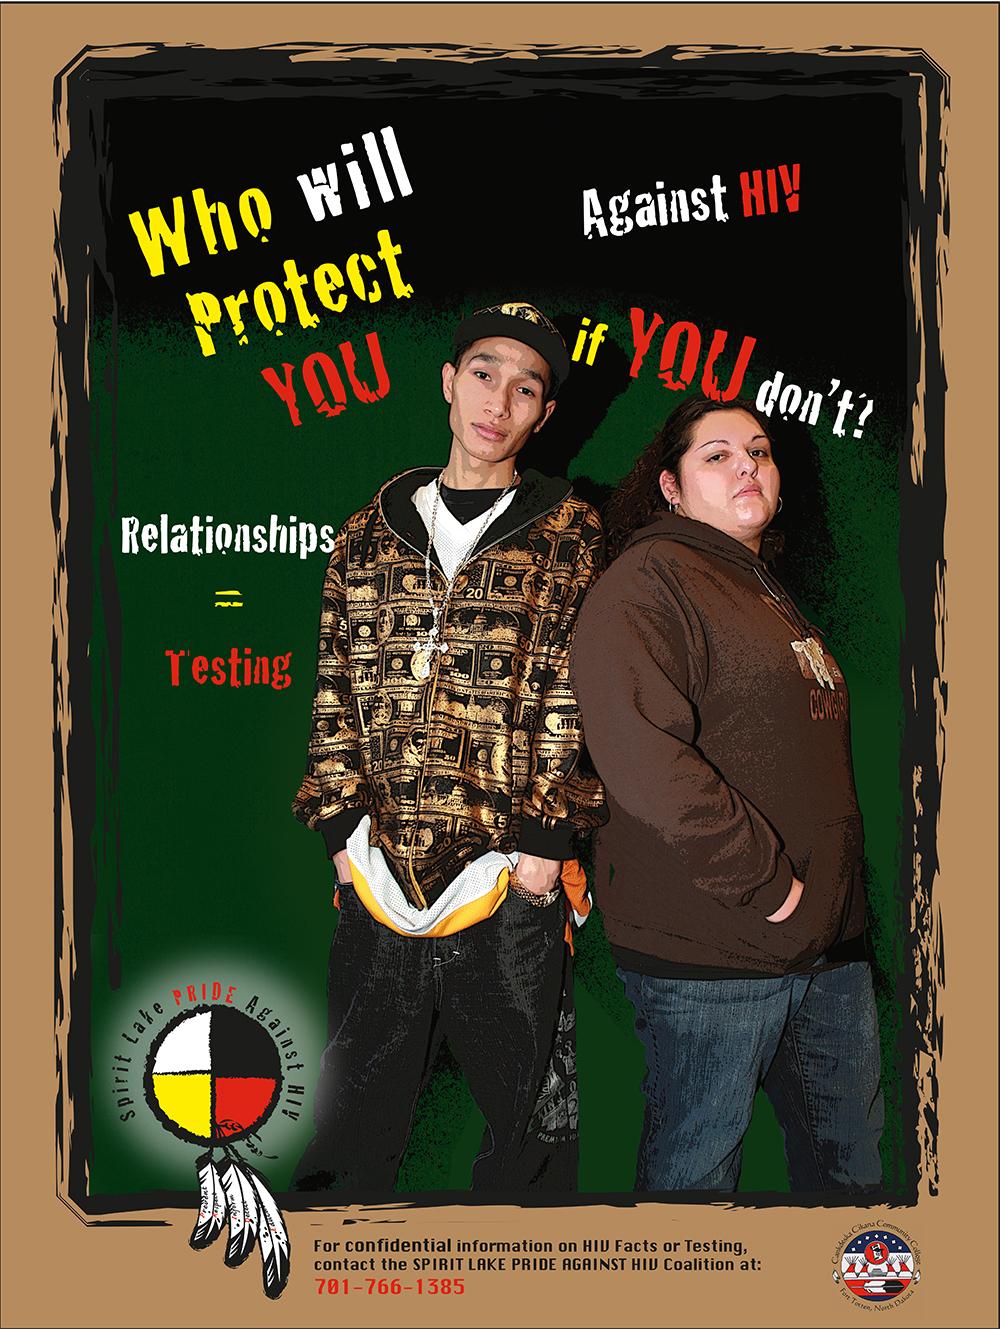 Spirit Lake Pride Against HIV